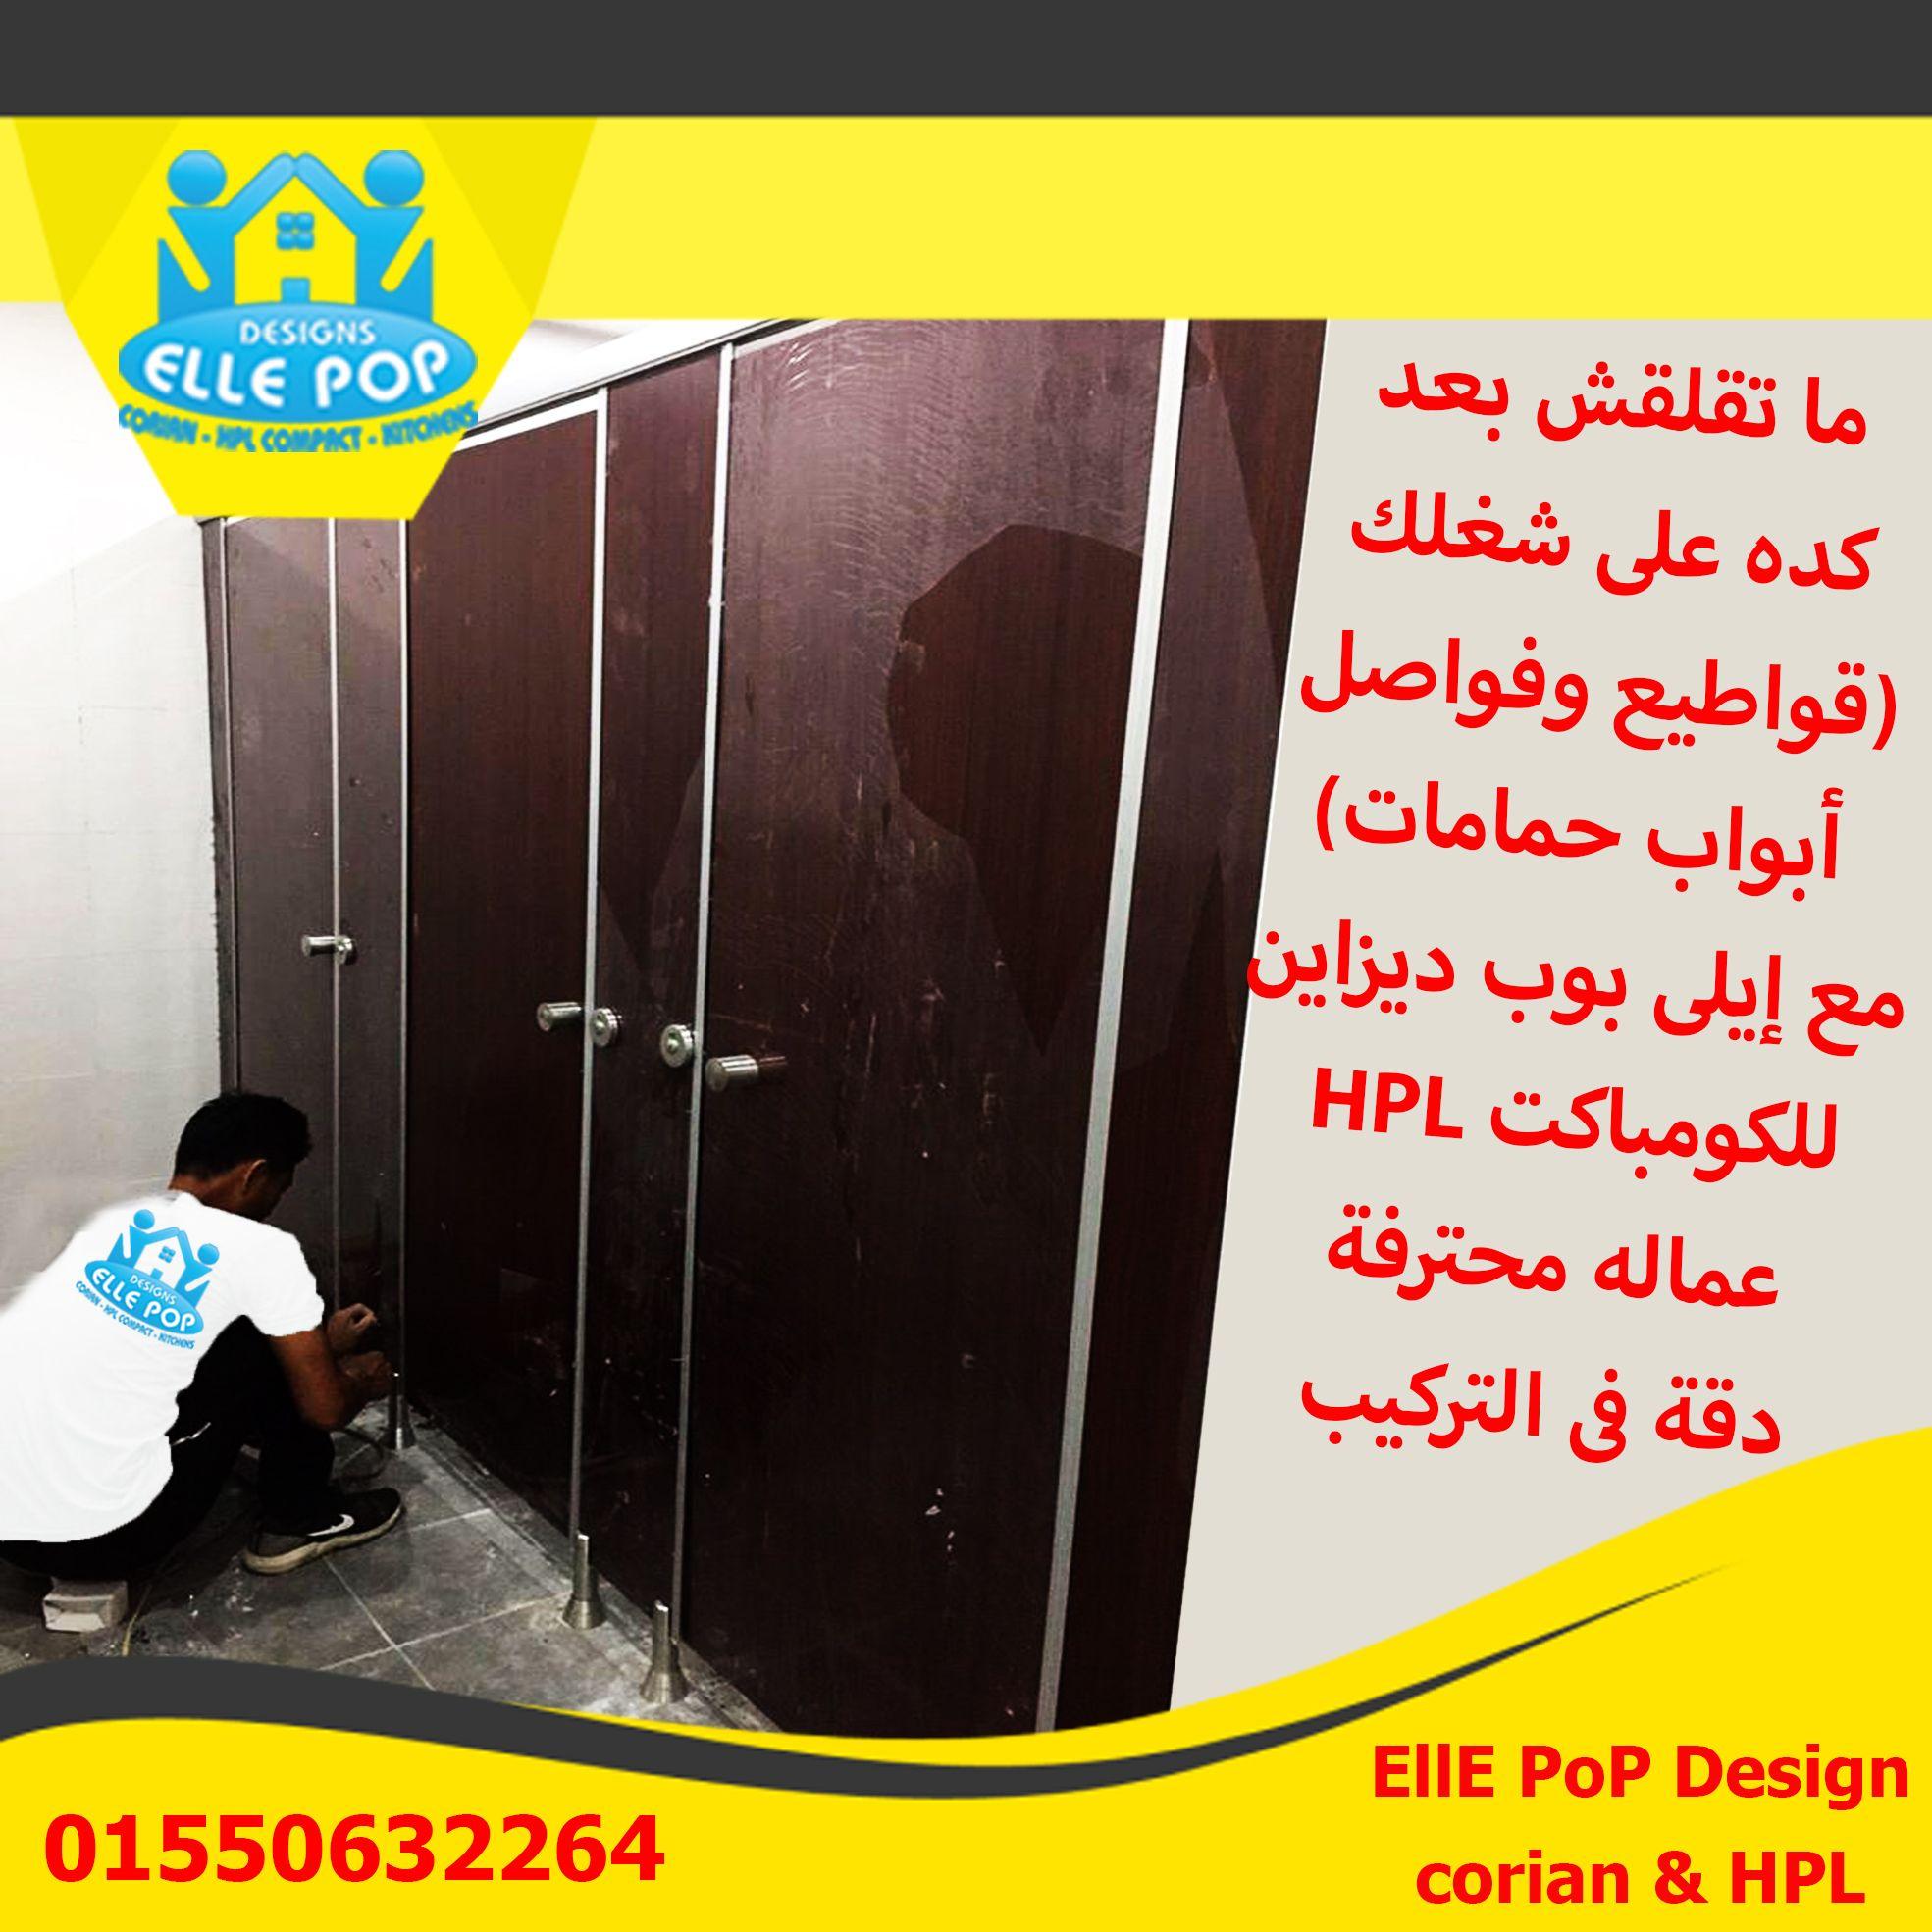 قواطيع حمامات فواصل حمامات بارتشن حمامات ابواب حمامات من خامة الكومباكتhpl ت 01222365640 Locker Storage Decor Home Decor